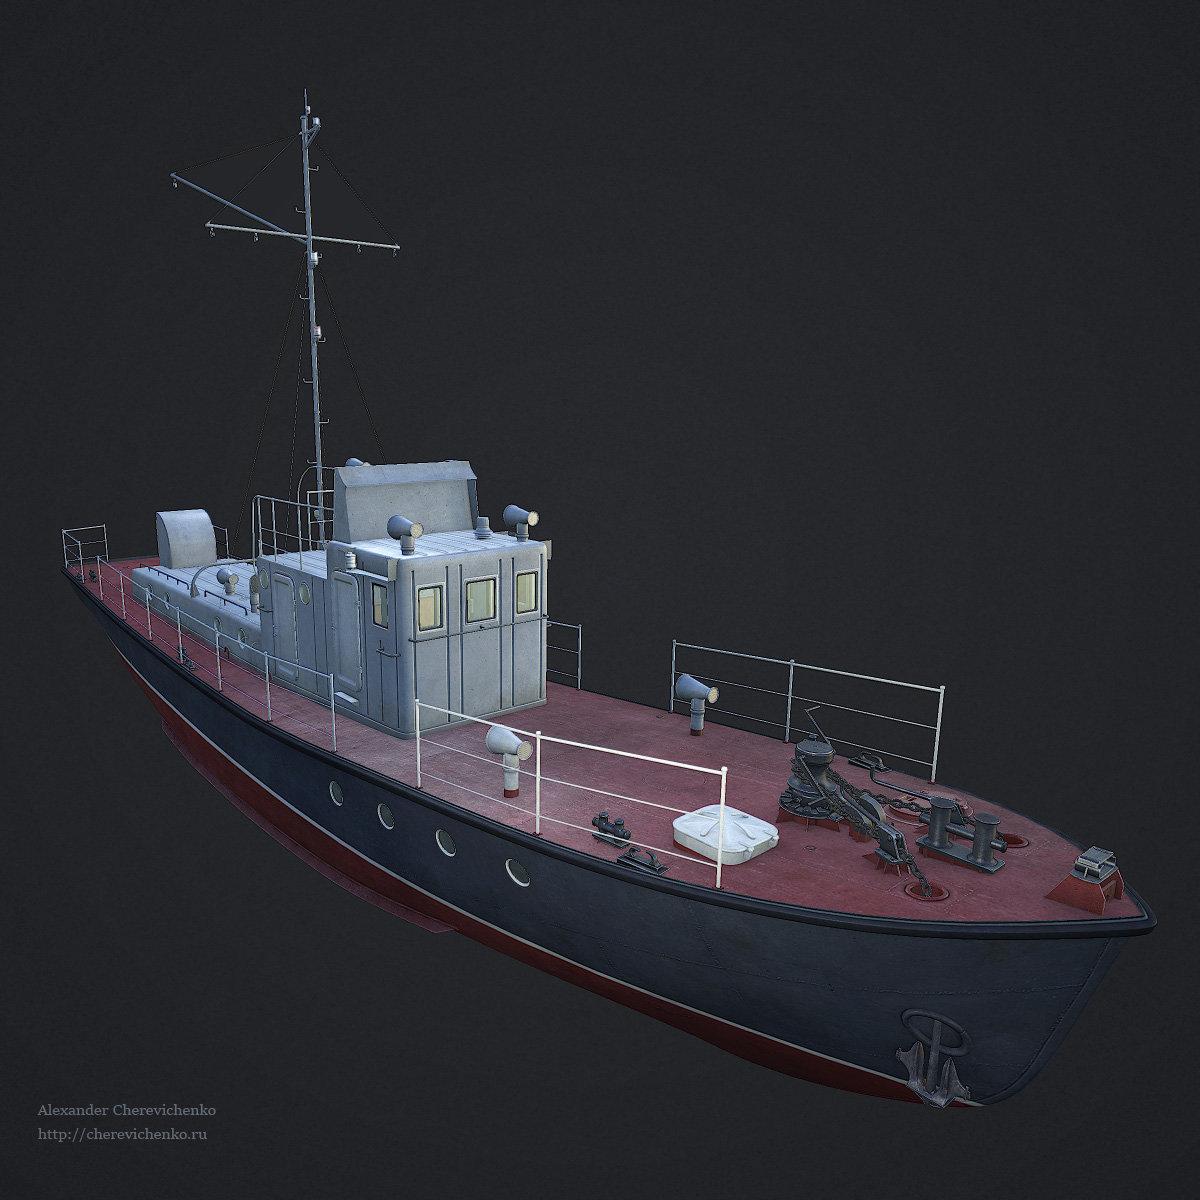 alexander-cherevichenko-boat-yaroslavets-376y-01.jpg